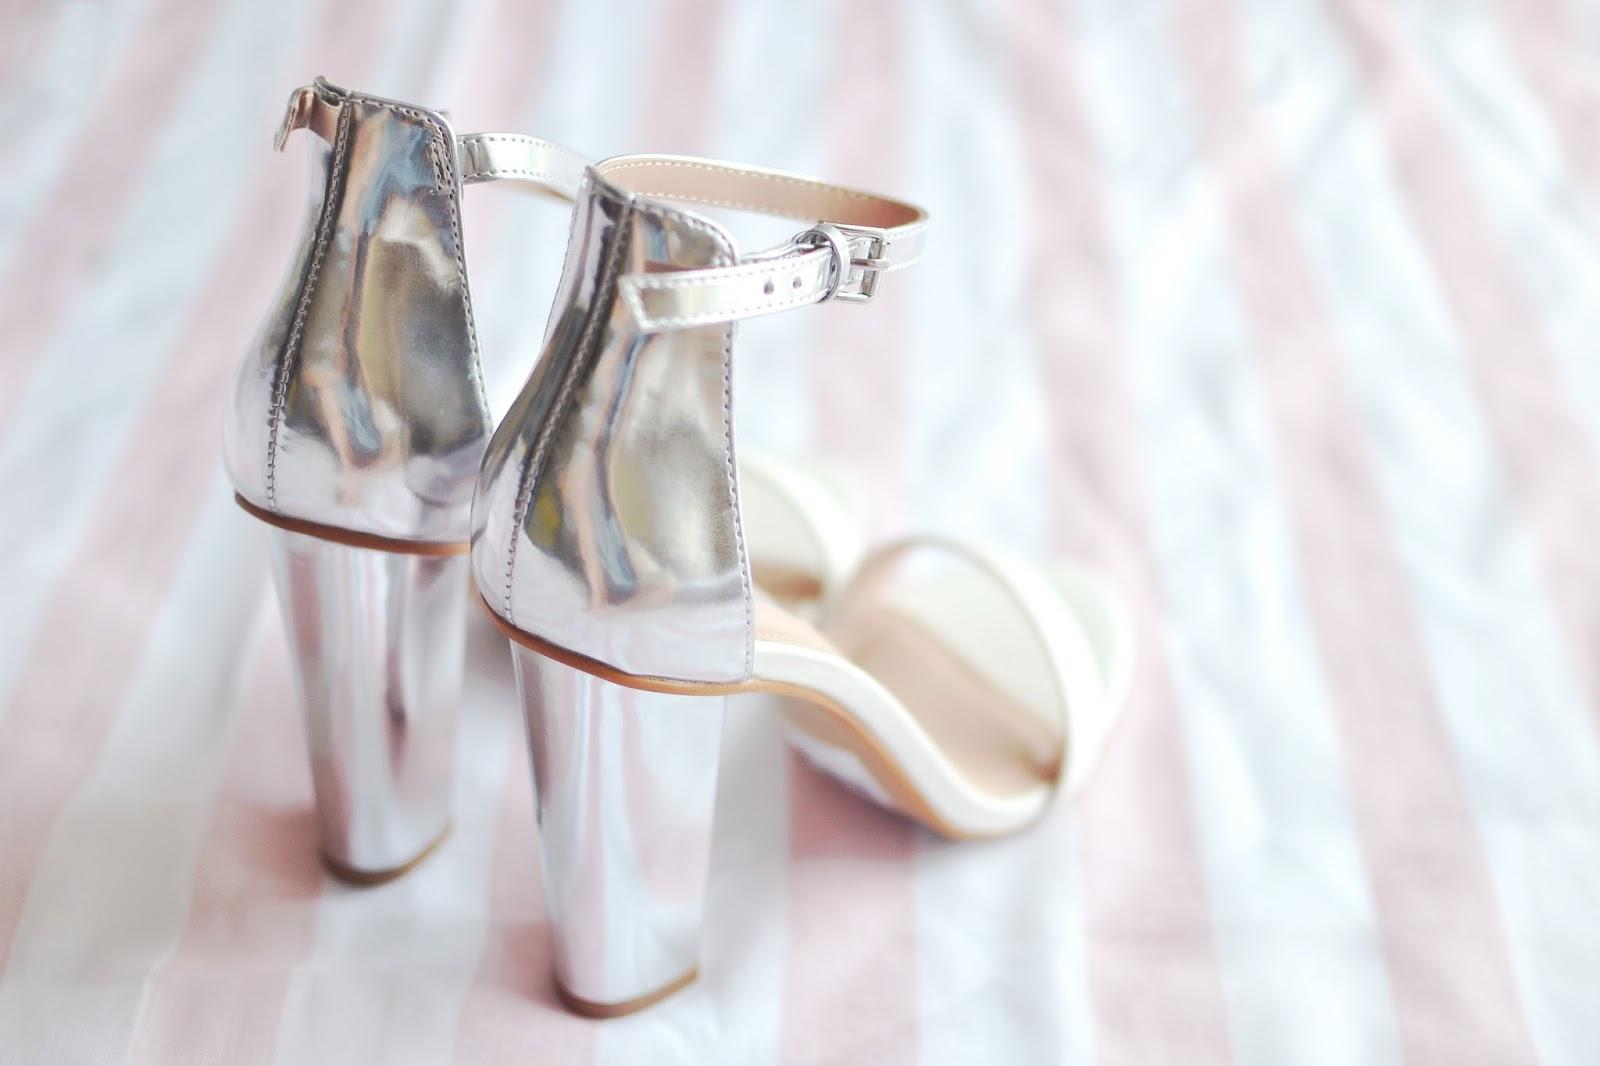 High heeled sandals, dorothy perkins heels